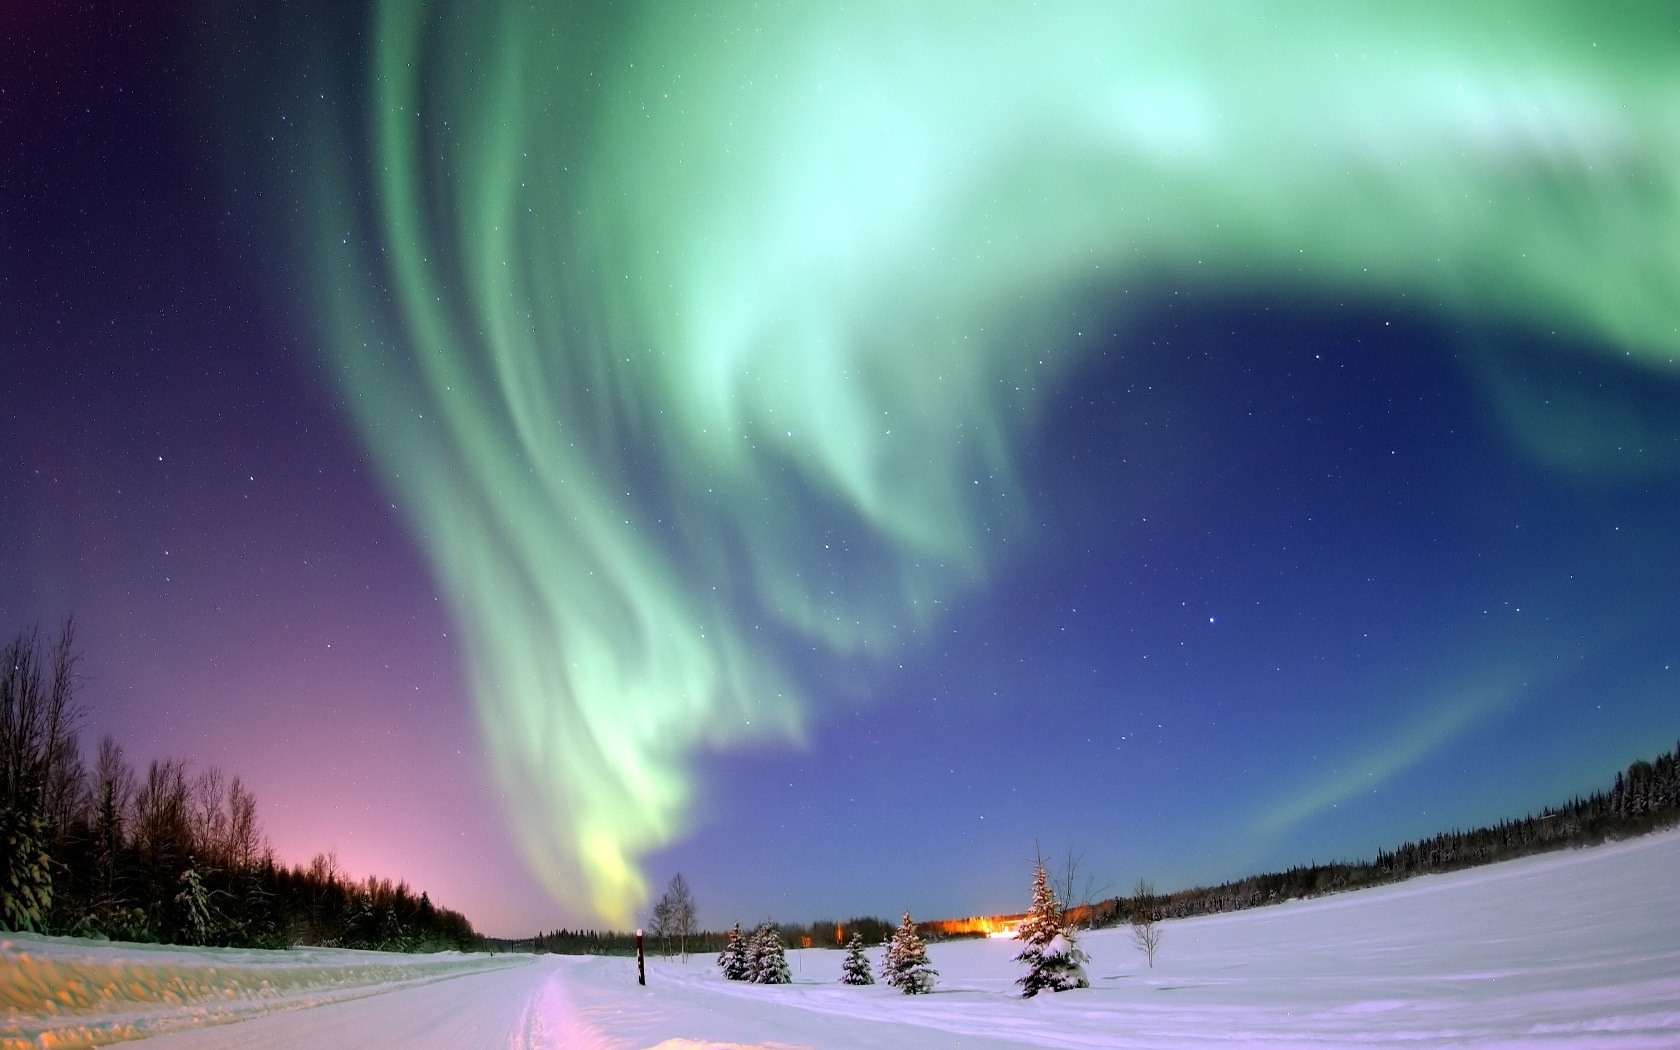 Aurora polare - Aurora boreale